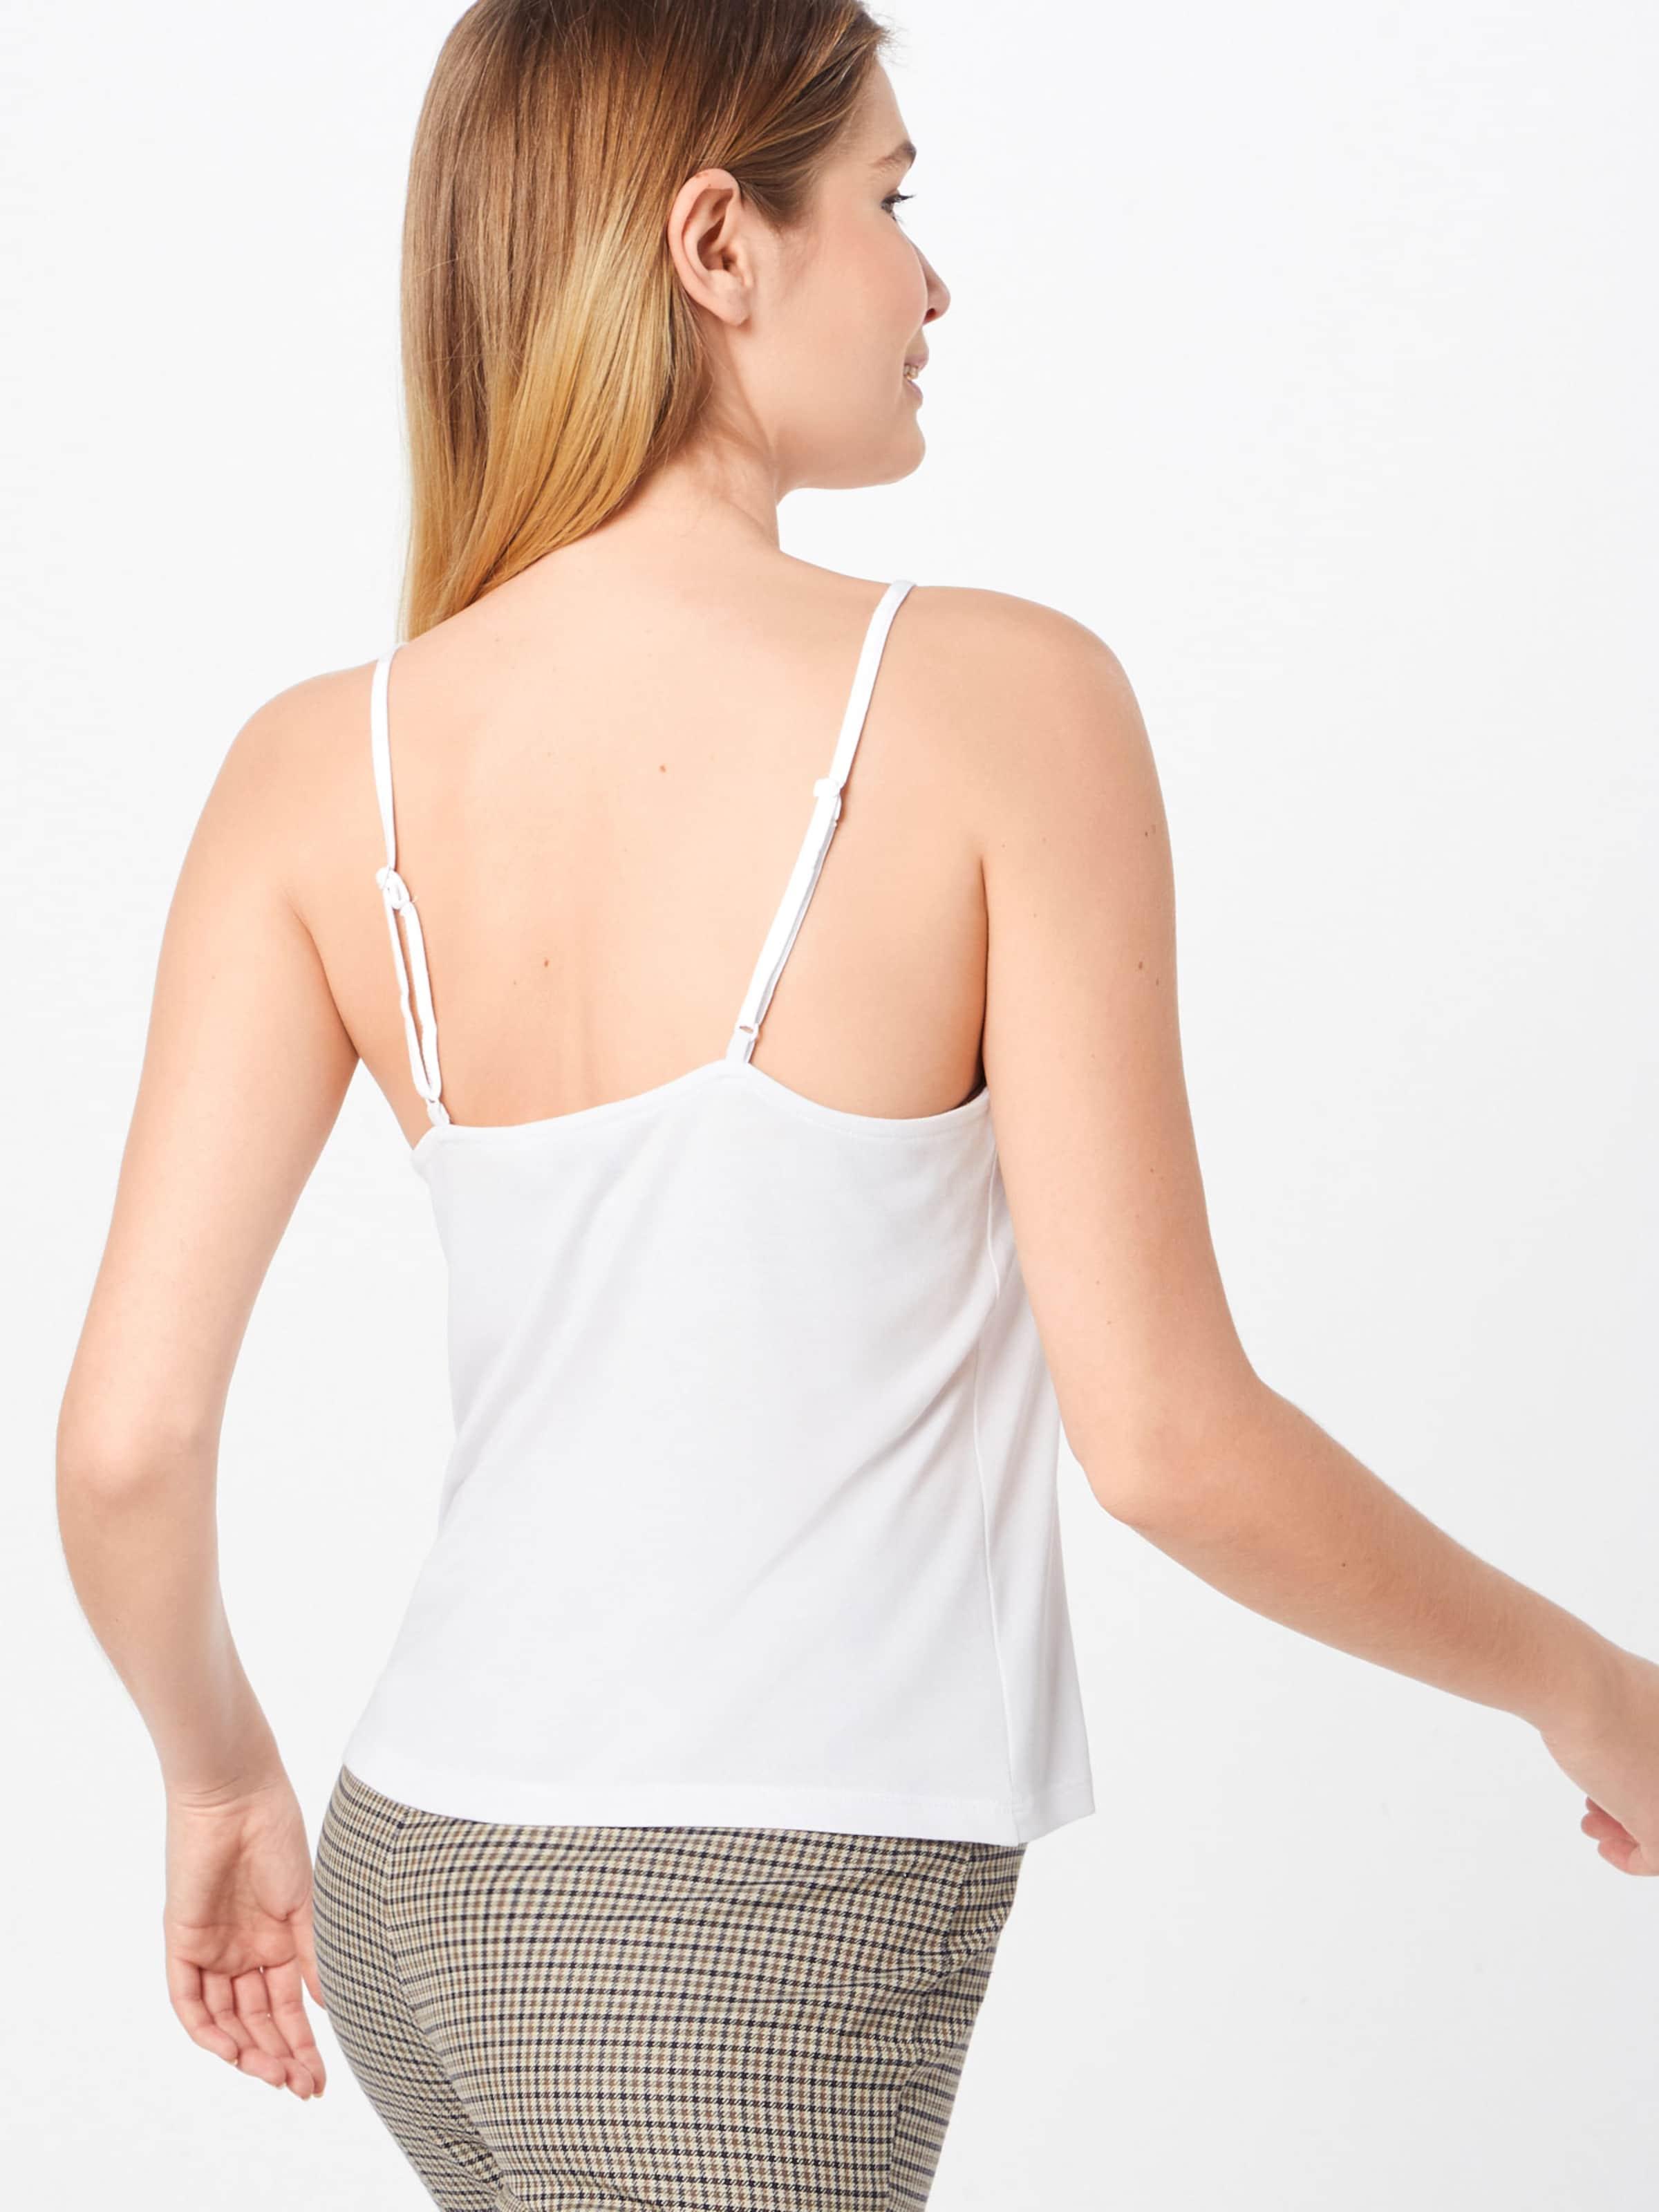 Slip Detailed 'lace En Haut Na Blanc kd Singlet' VqzLMpGSU